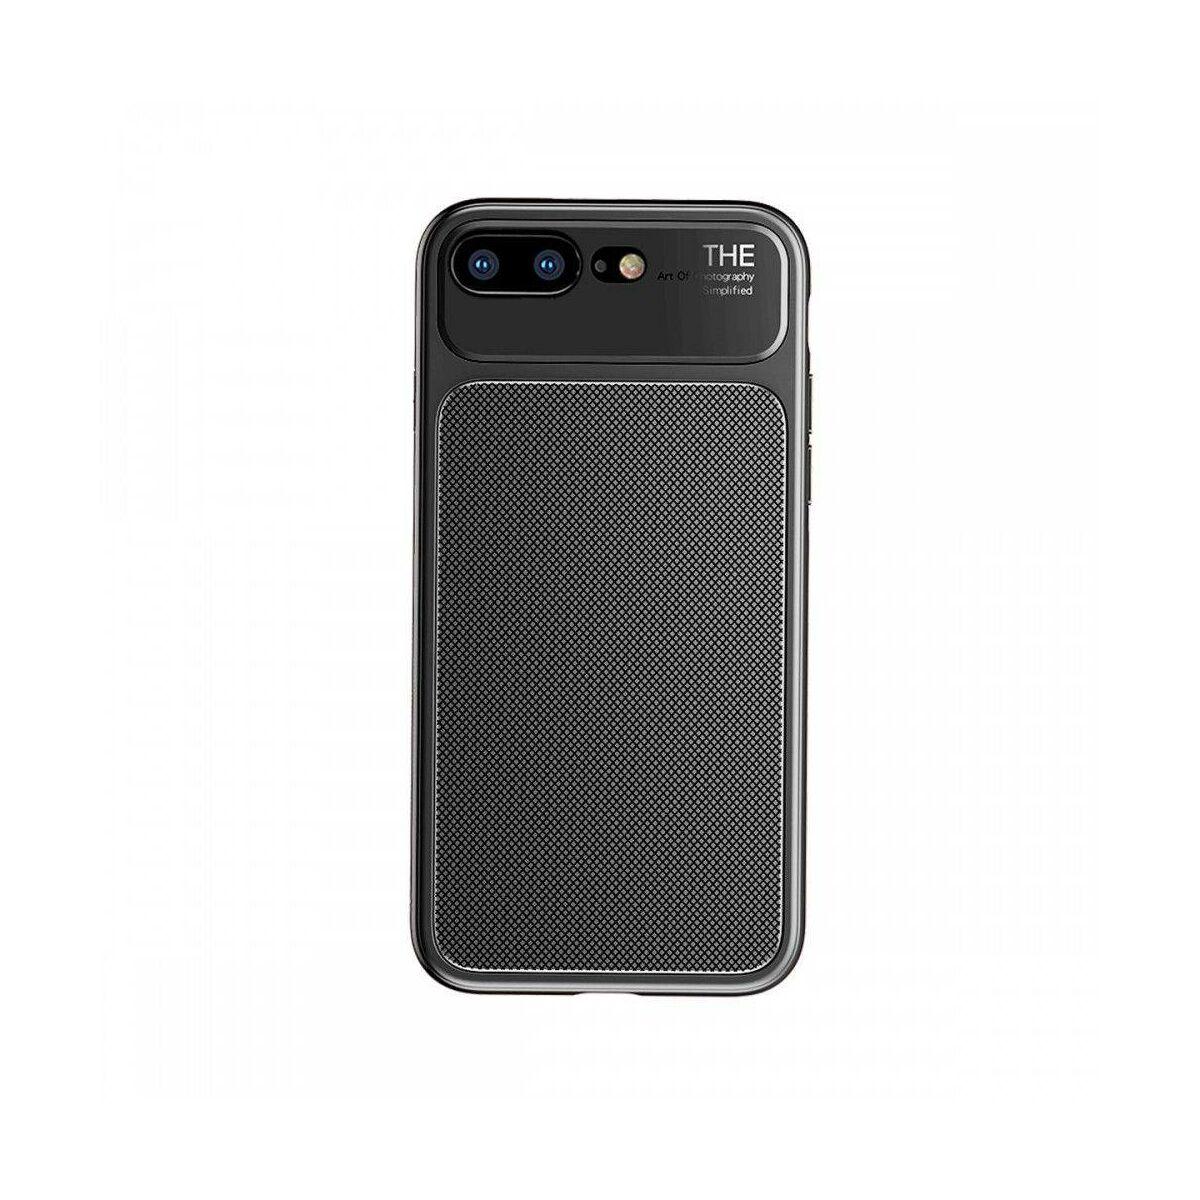 Baseus iPhone 8/7 Plus tok, Knight, fekete (WIAPIPH8P-JU01)